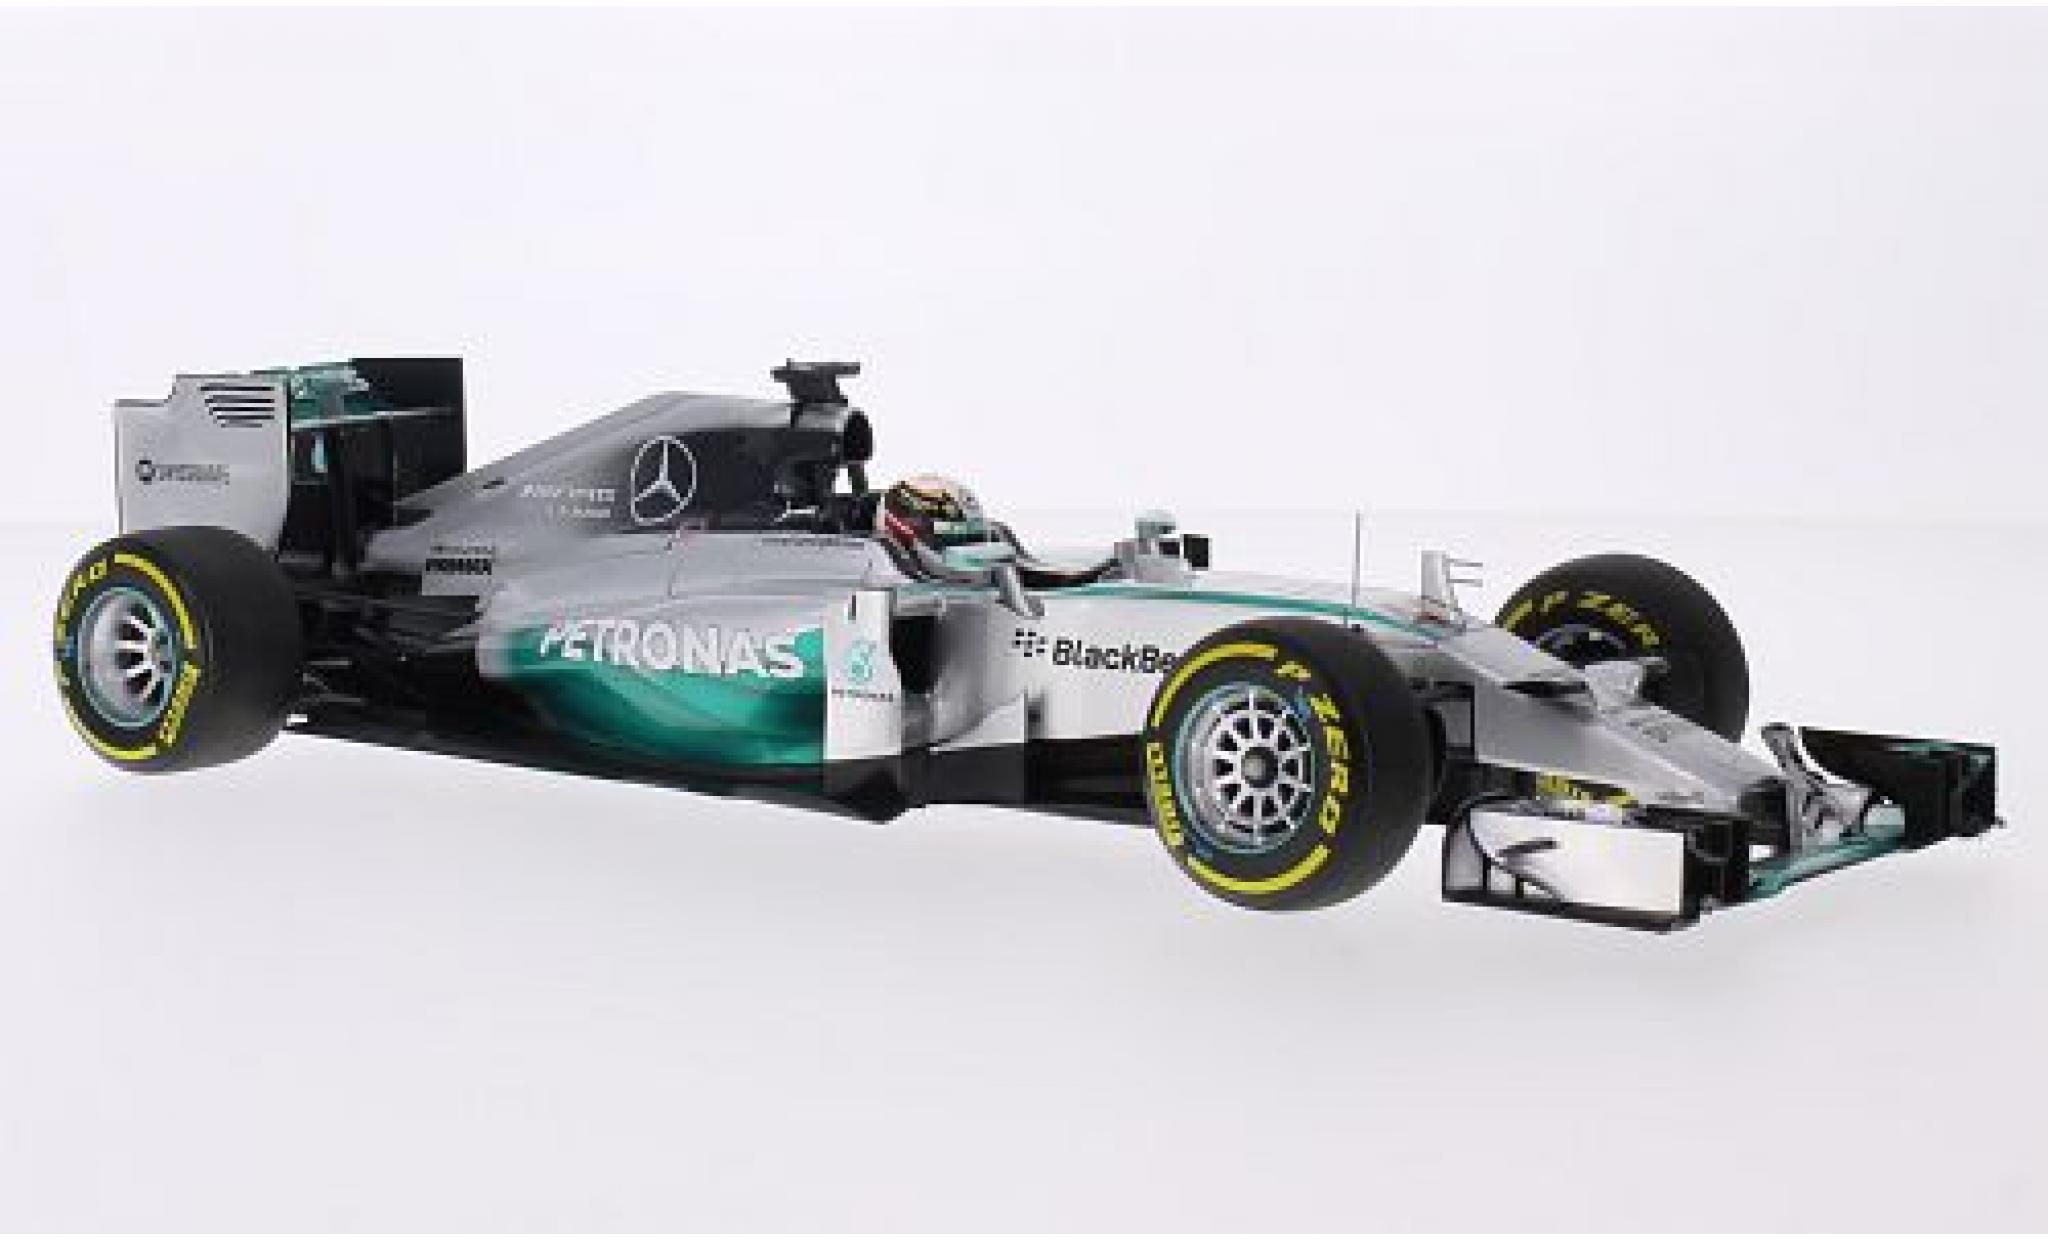 Mercedes F1 1/18 Minichamps W05 Hybrid No.44 AMG Petronas Team Petronas Formel 1 GP Abu Dhabi 2014 avec figurine de conducteur L.Hamilton